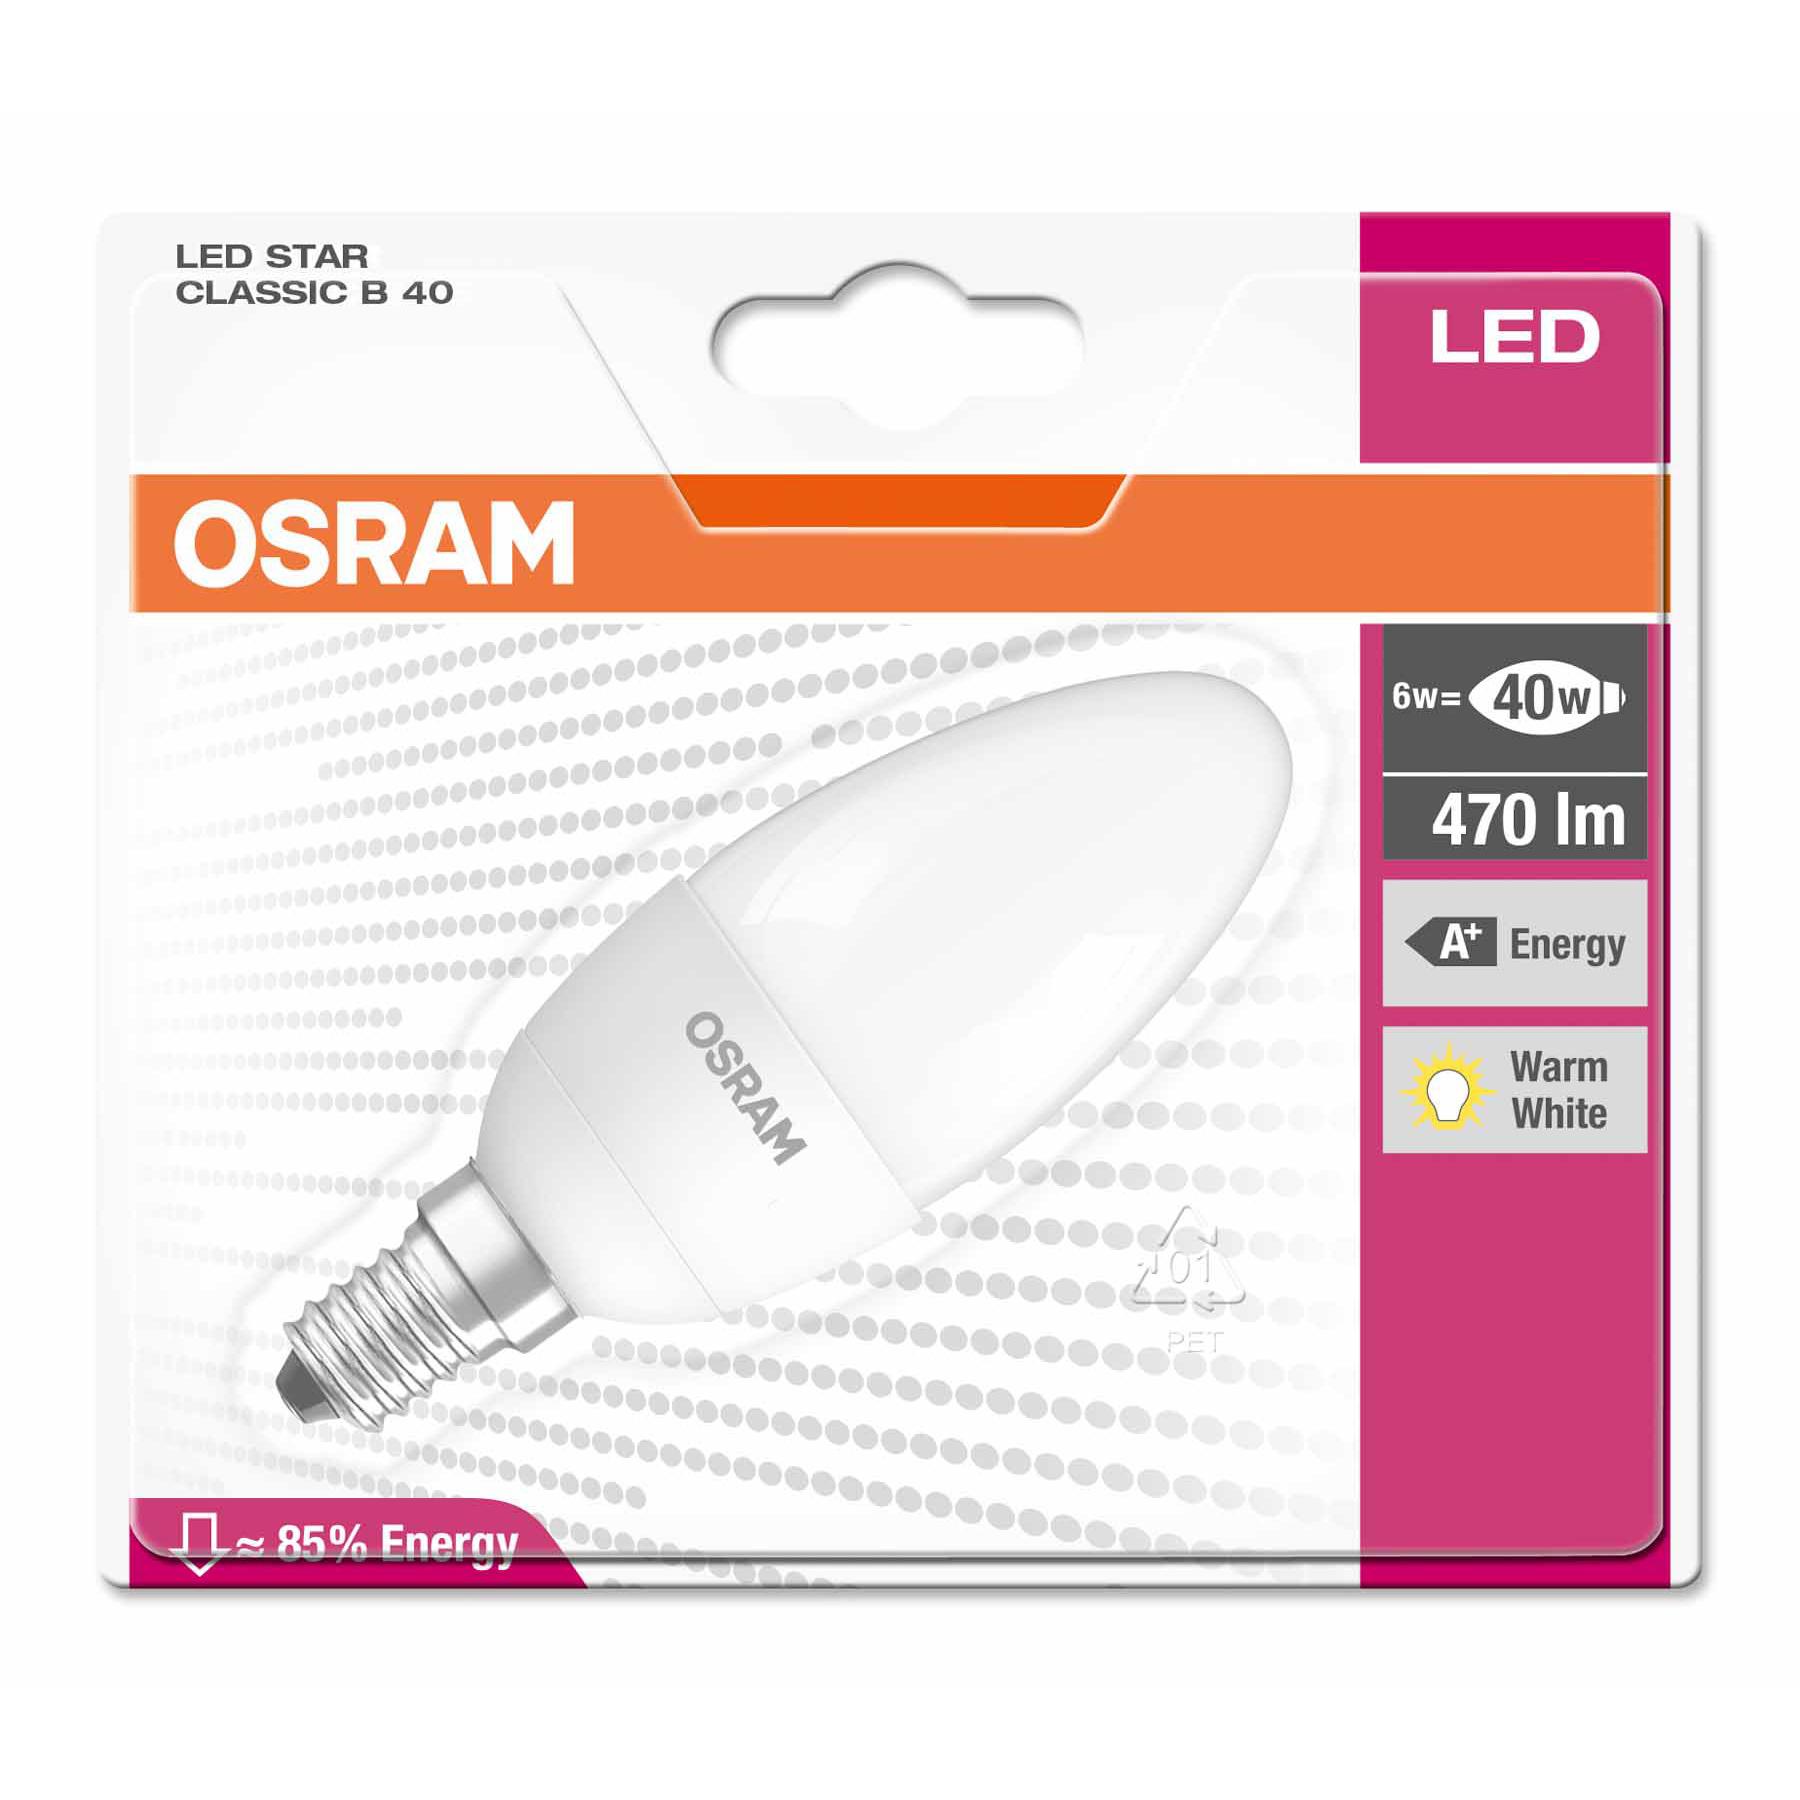 Niedlich Osram Led Lampen Test Fotos - Hauptinnenideen - kakados.com